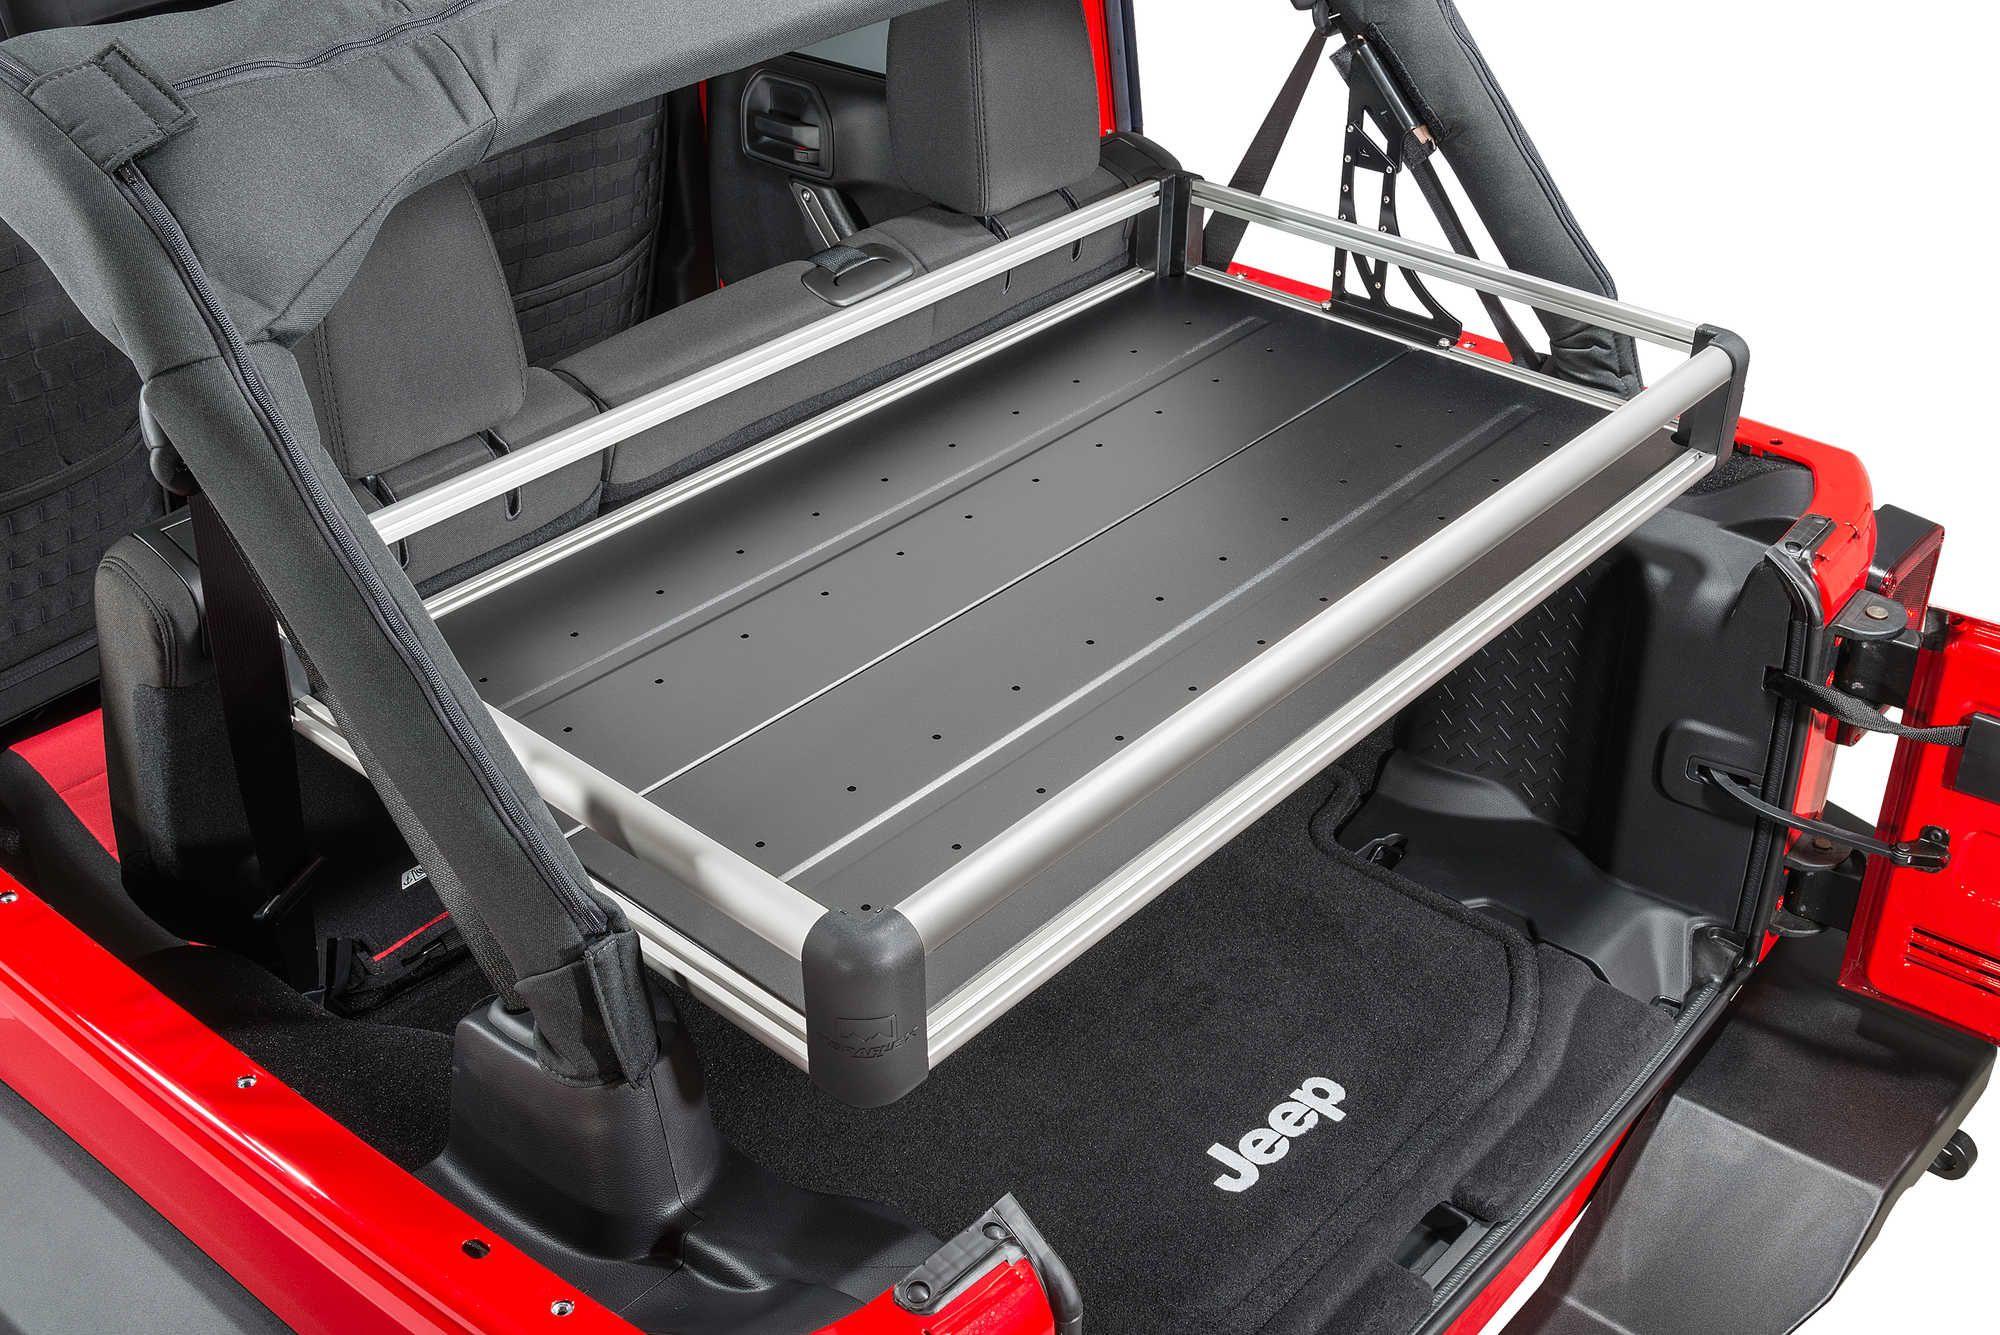 Teraflex Rear Utility Cargo Rack For 07 18 Jeep Wrangler Unlimited